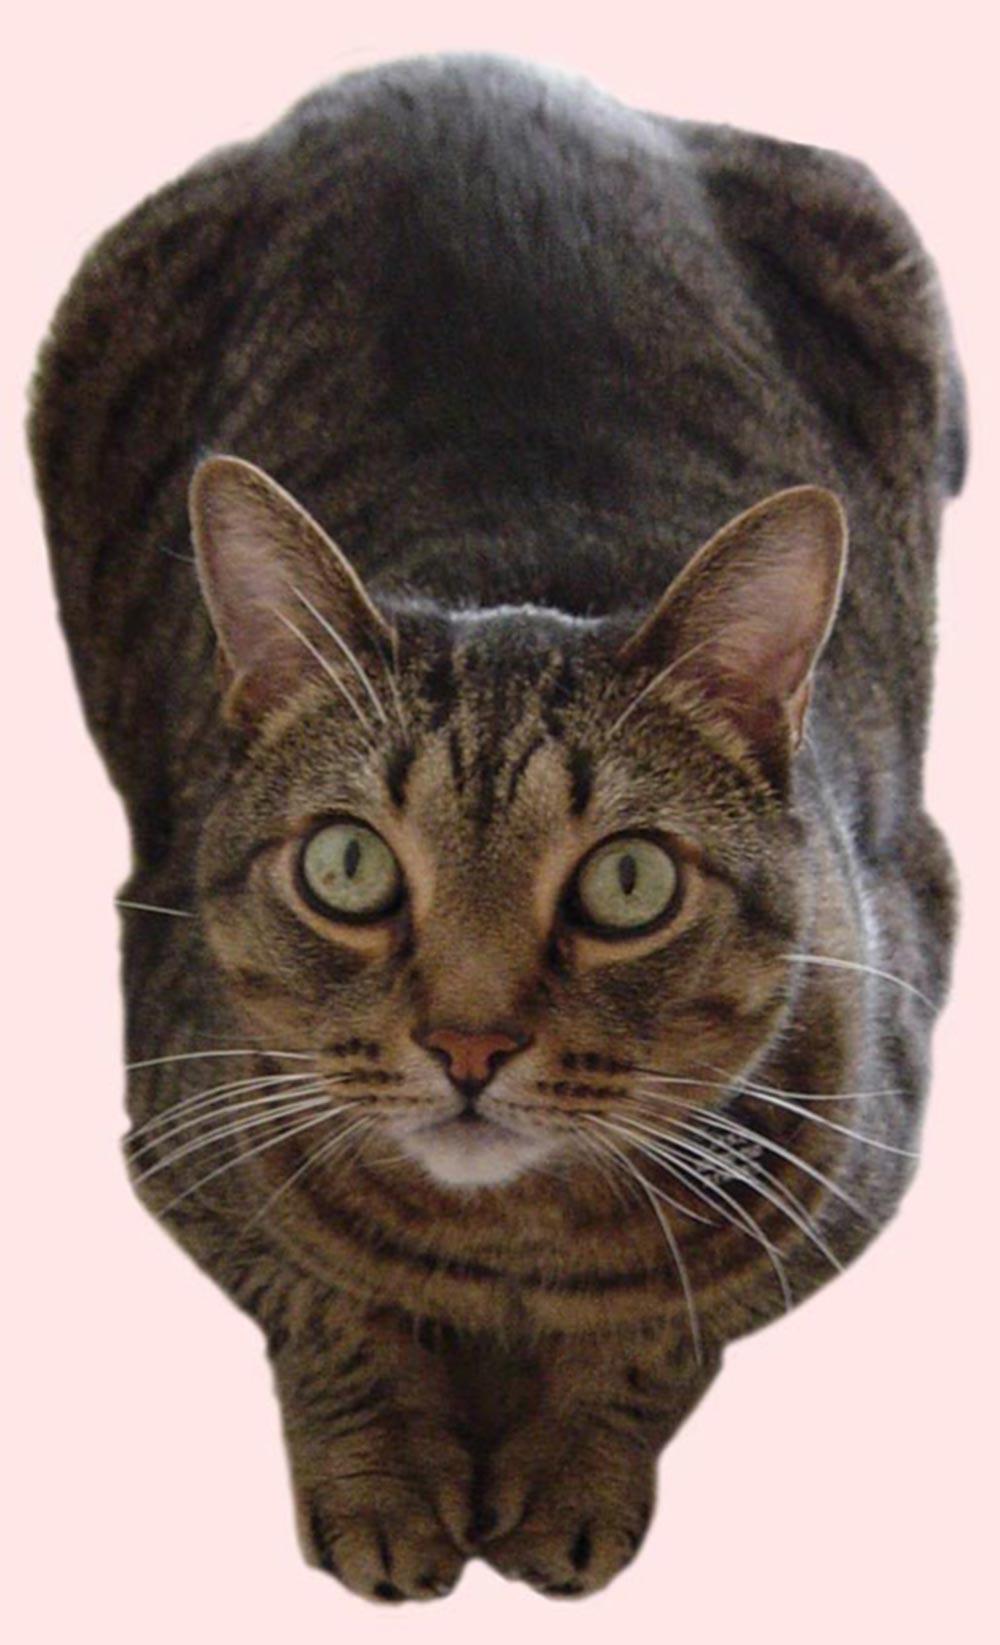 California Spangled Kitten: California California Spangled Cat Picture Breed